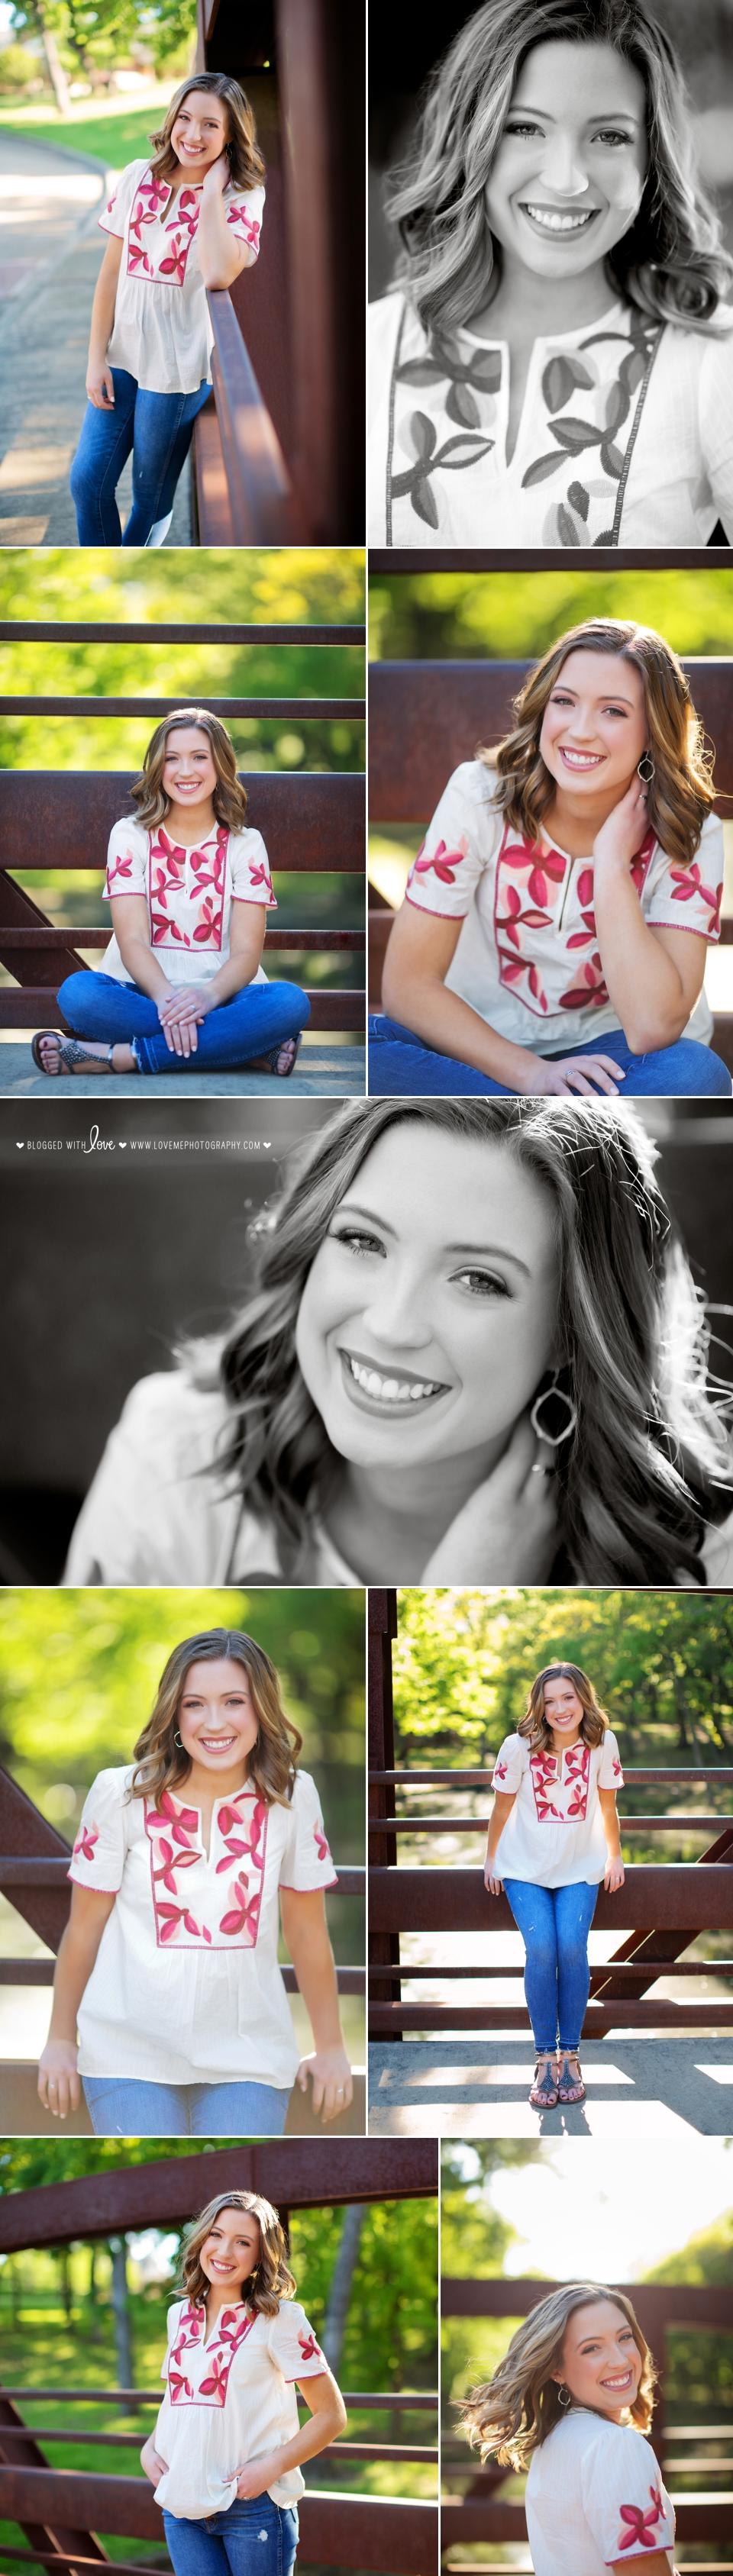 Blog   Senior Portrait Photographer in Dallas-Fort Worth